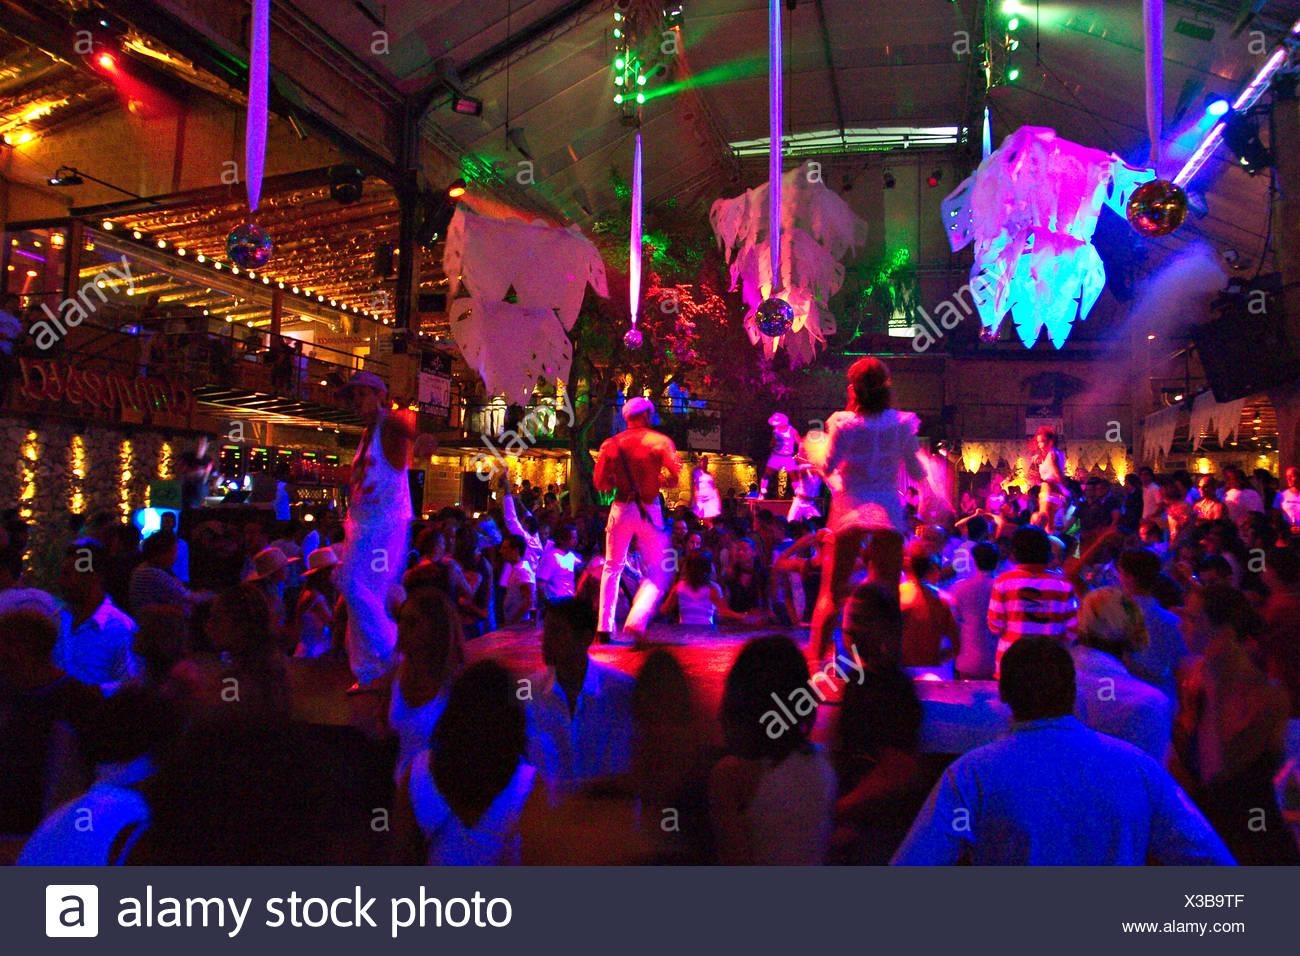 discotheque Amnesia near San Rafel in Ibiza - Stock Image